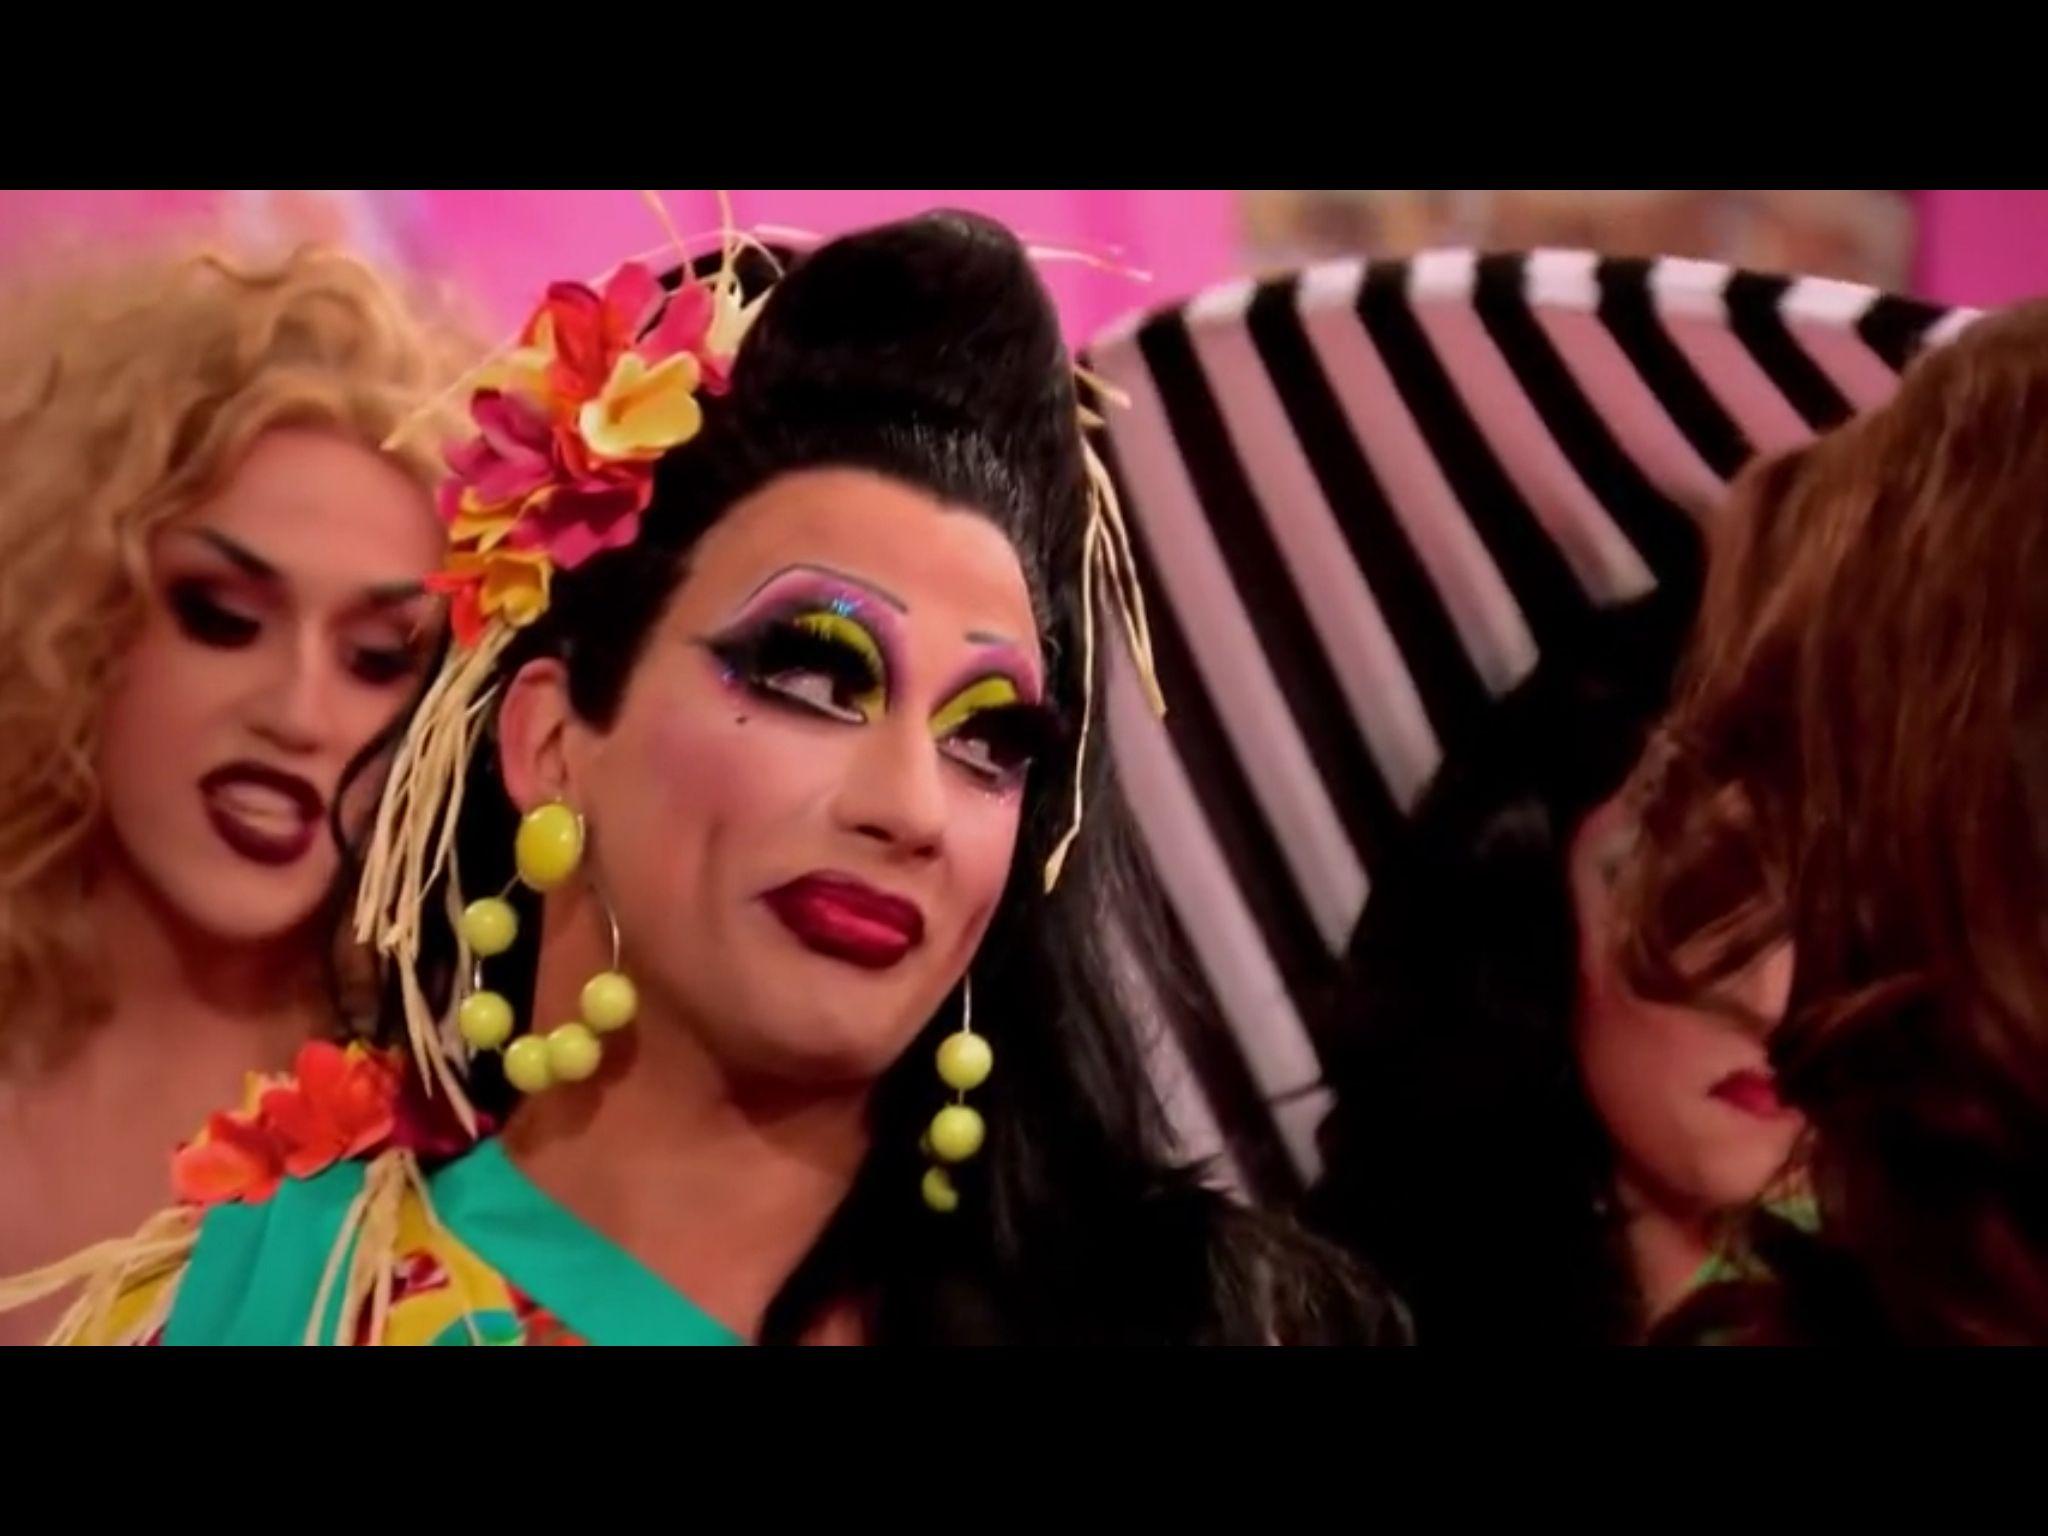 Cahokia gay dating